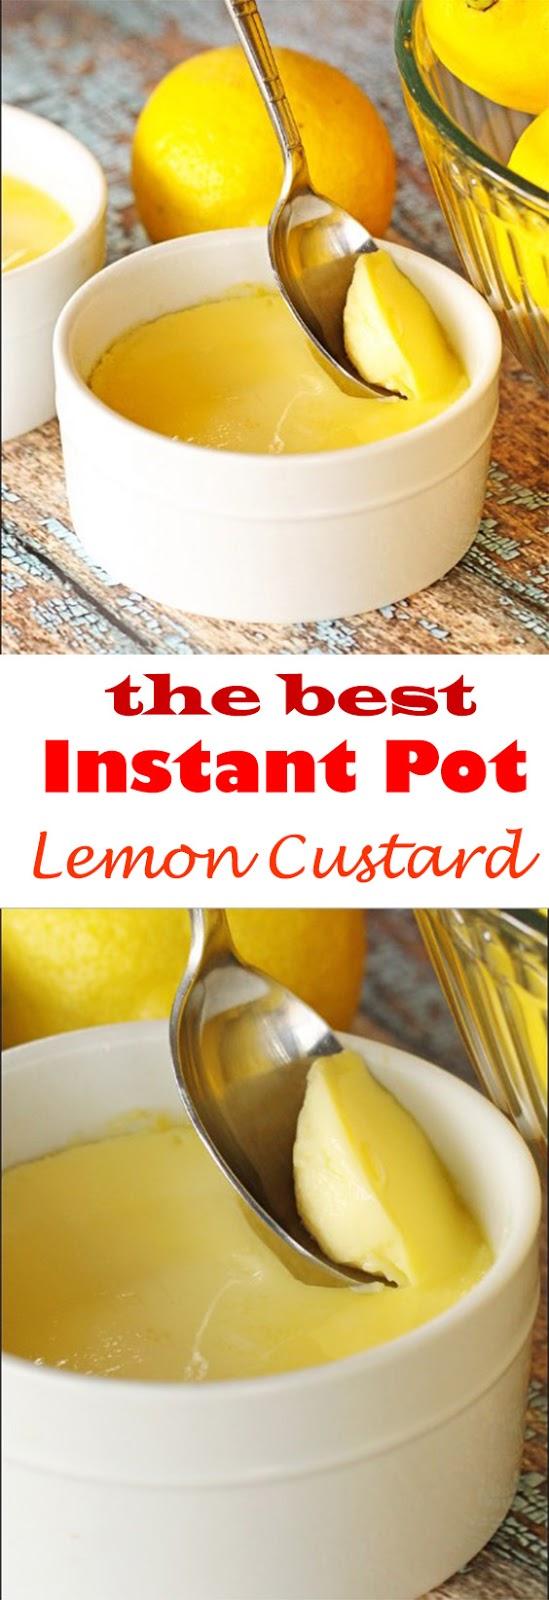 Lemon Custard in the Instant Pot